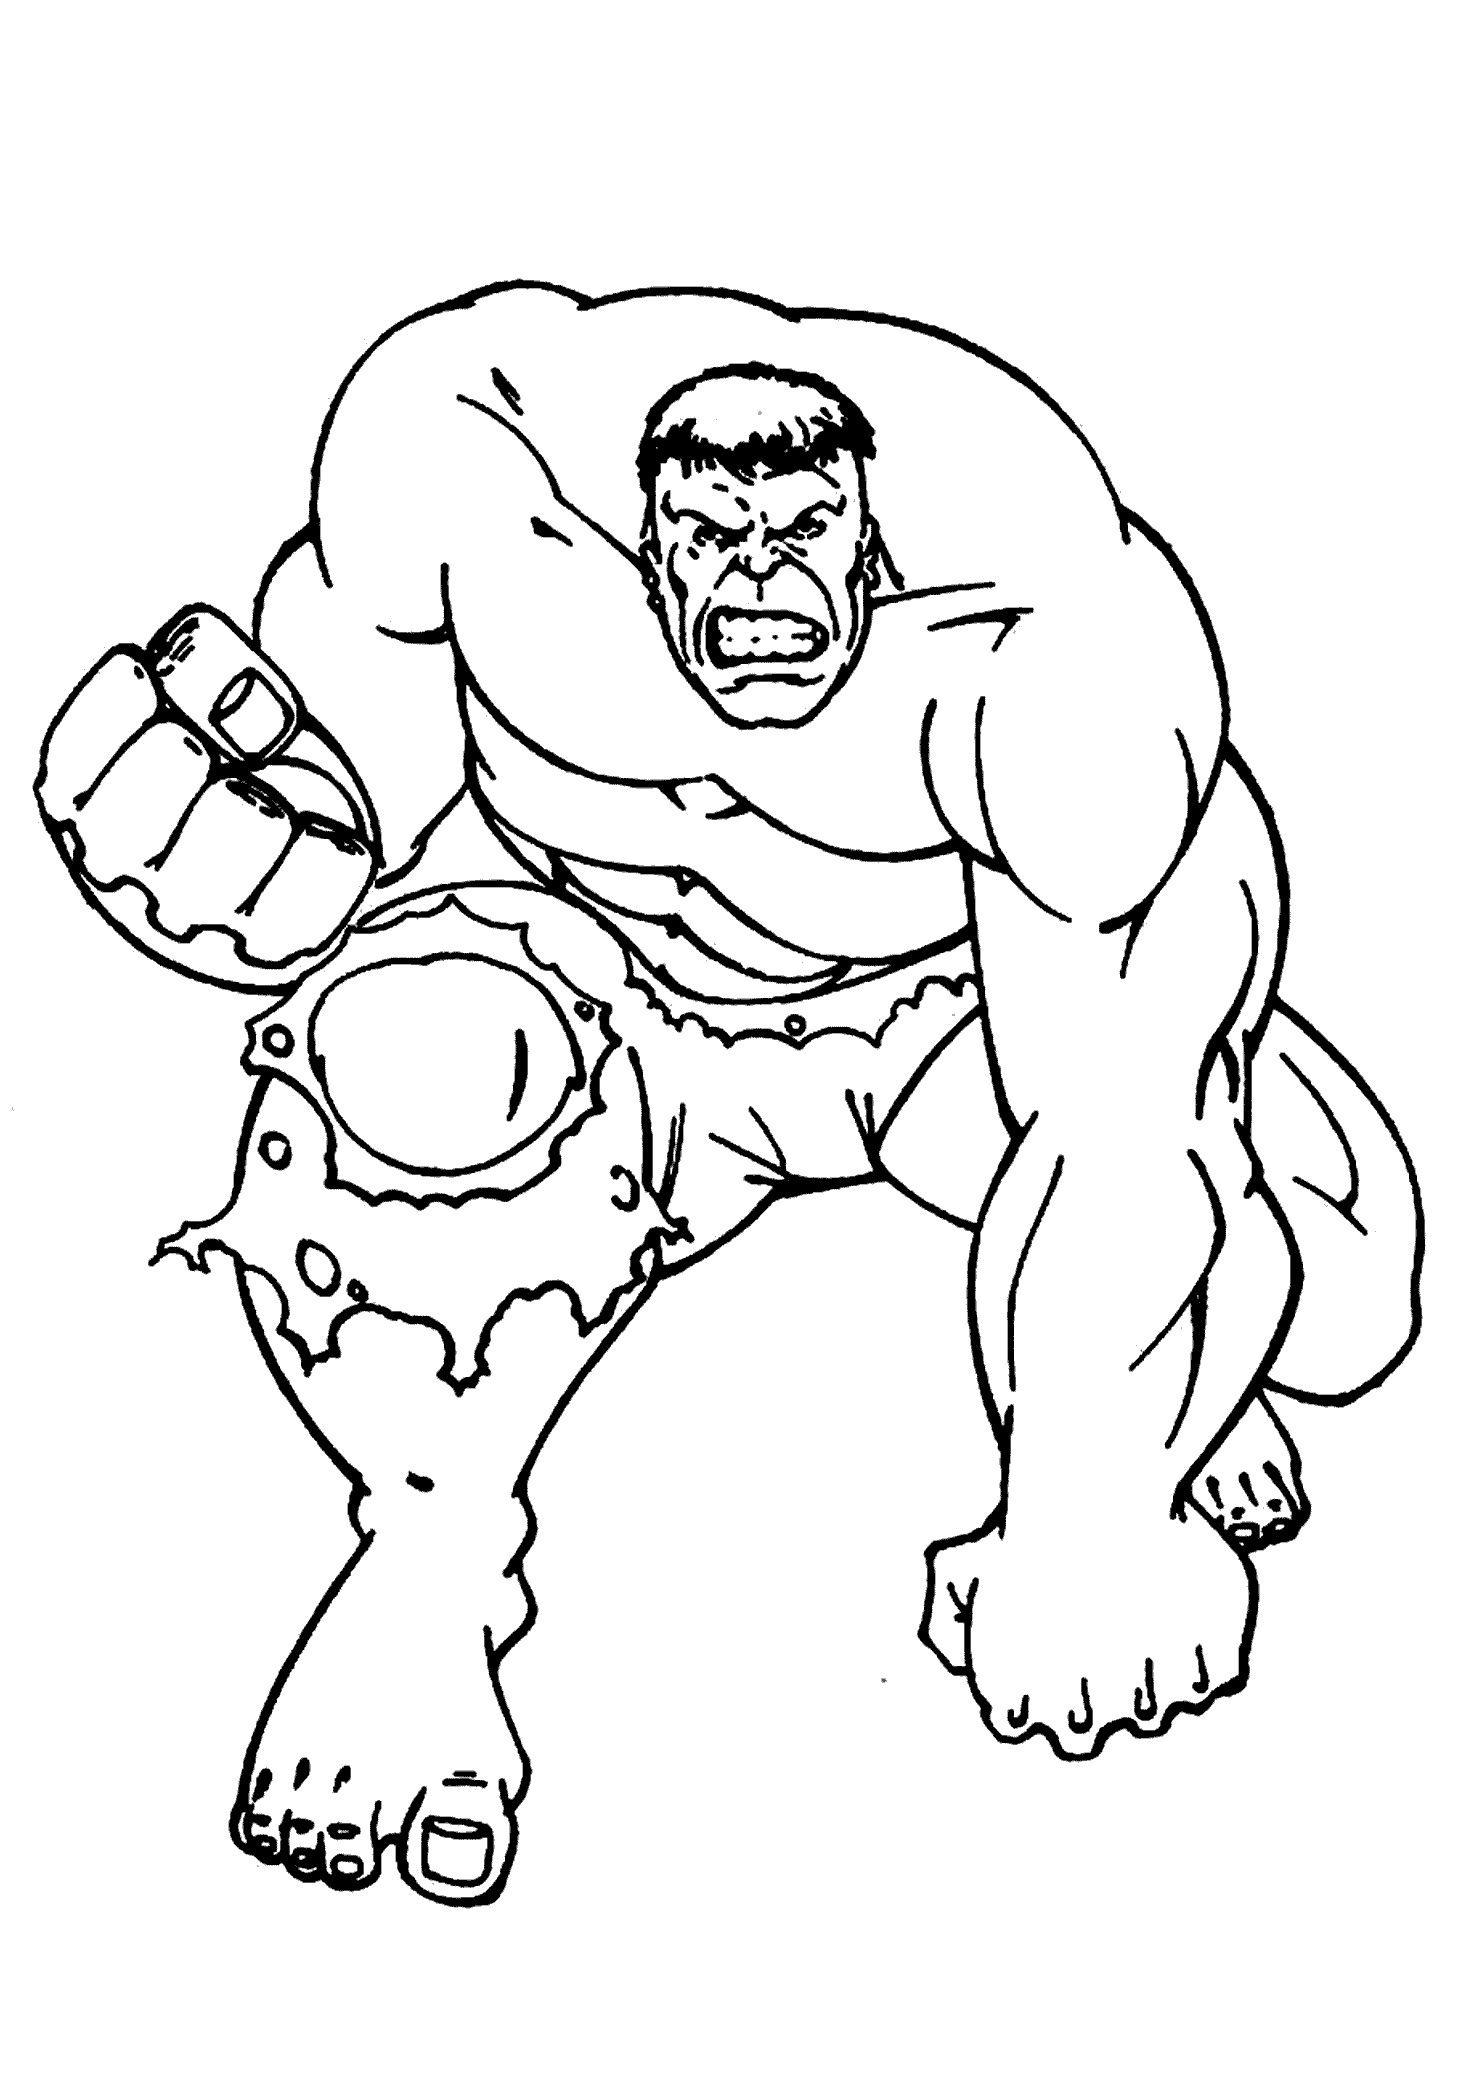 10 Incredible Hulk Hulk Coloring Pages Spiderman Coloring